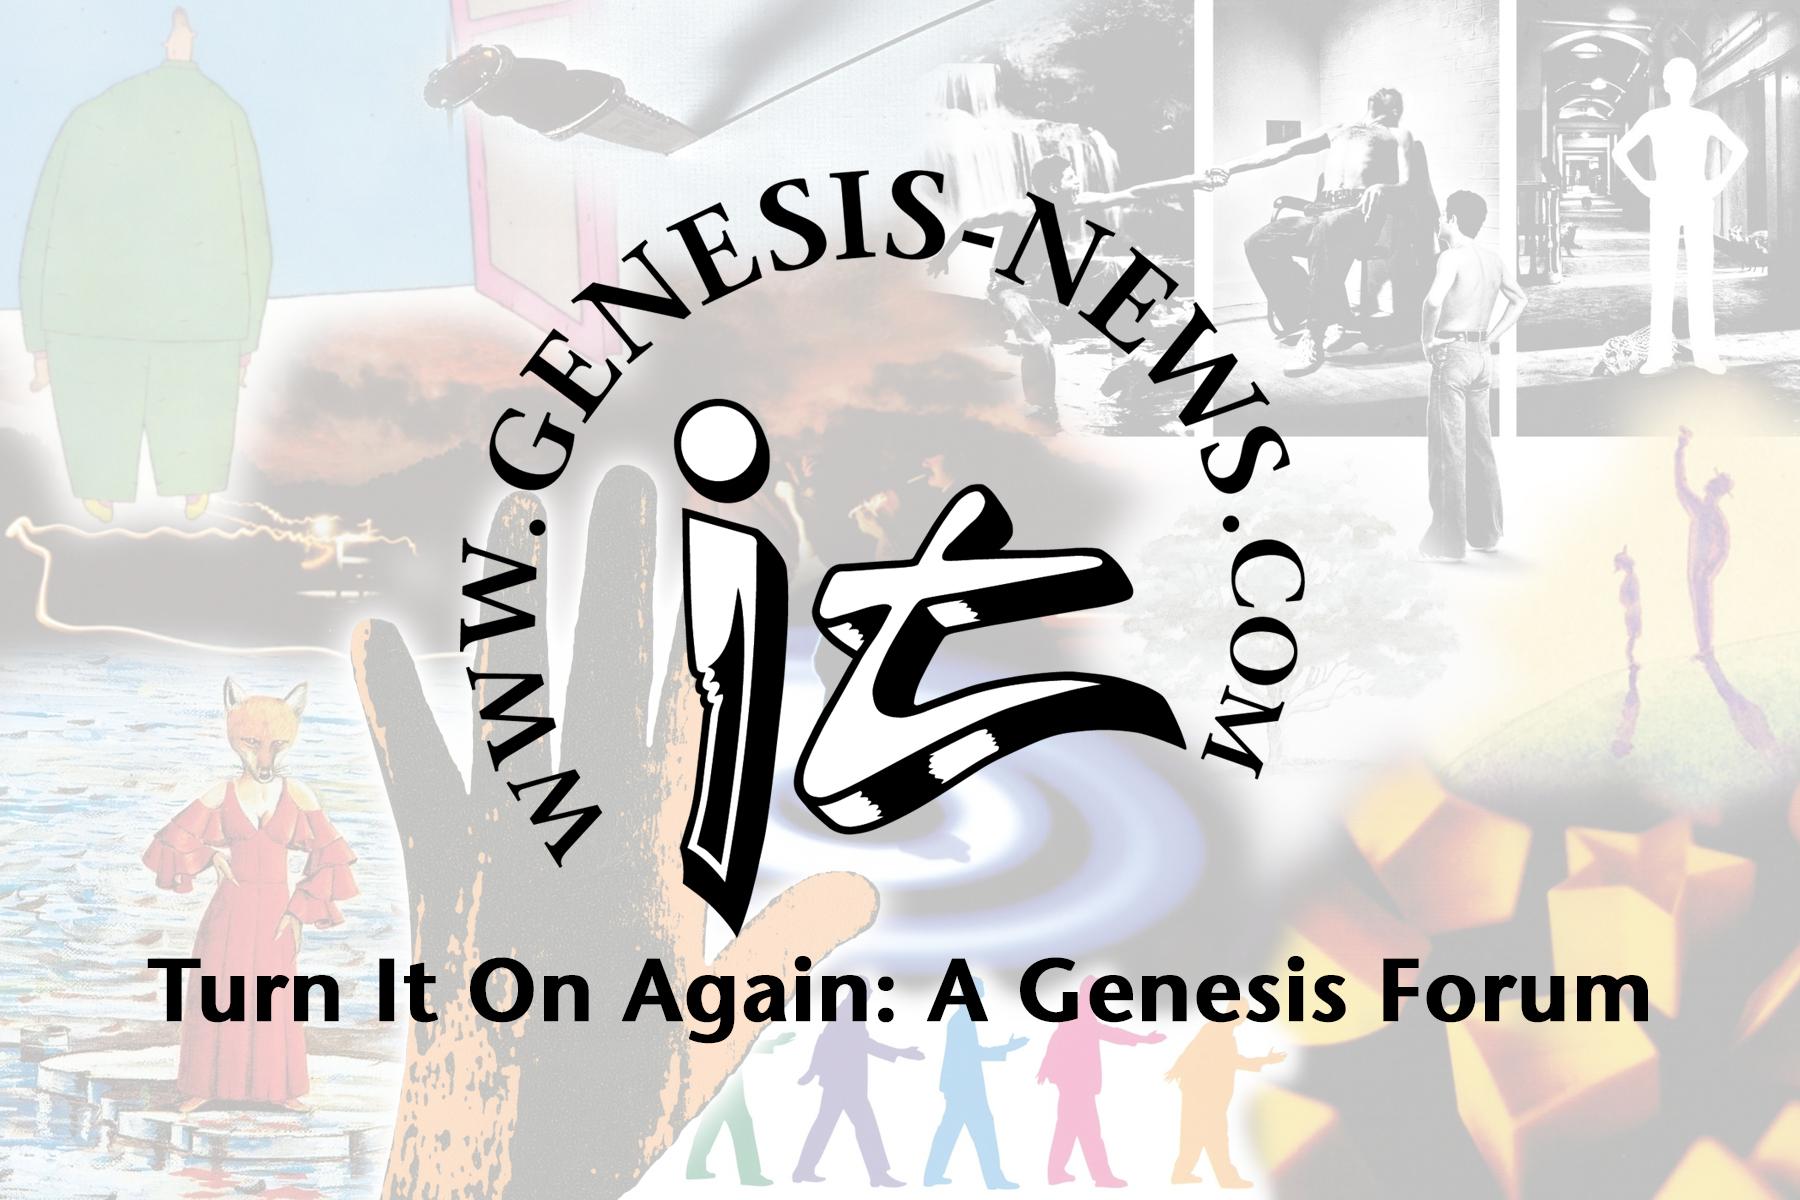 Turn It On Again: A Genesis Forum